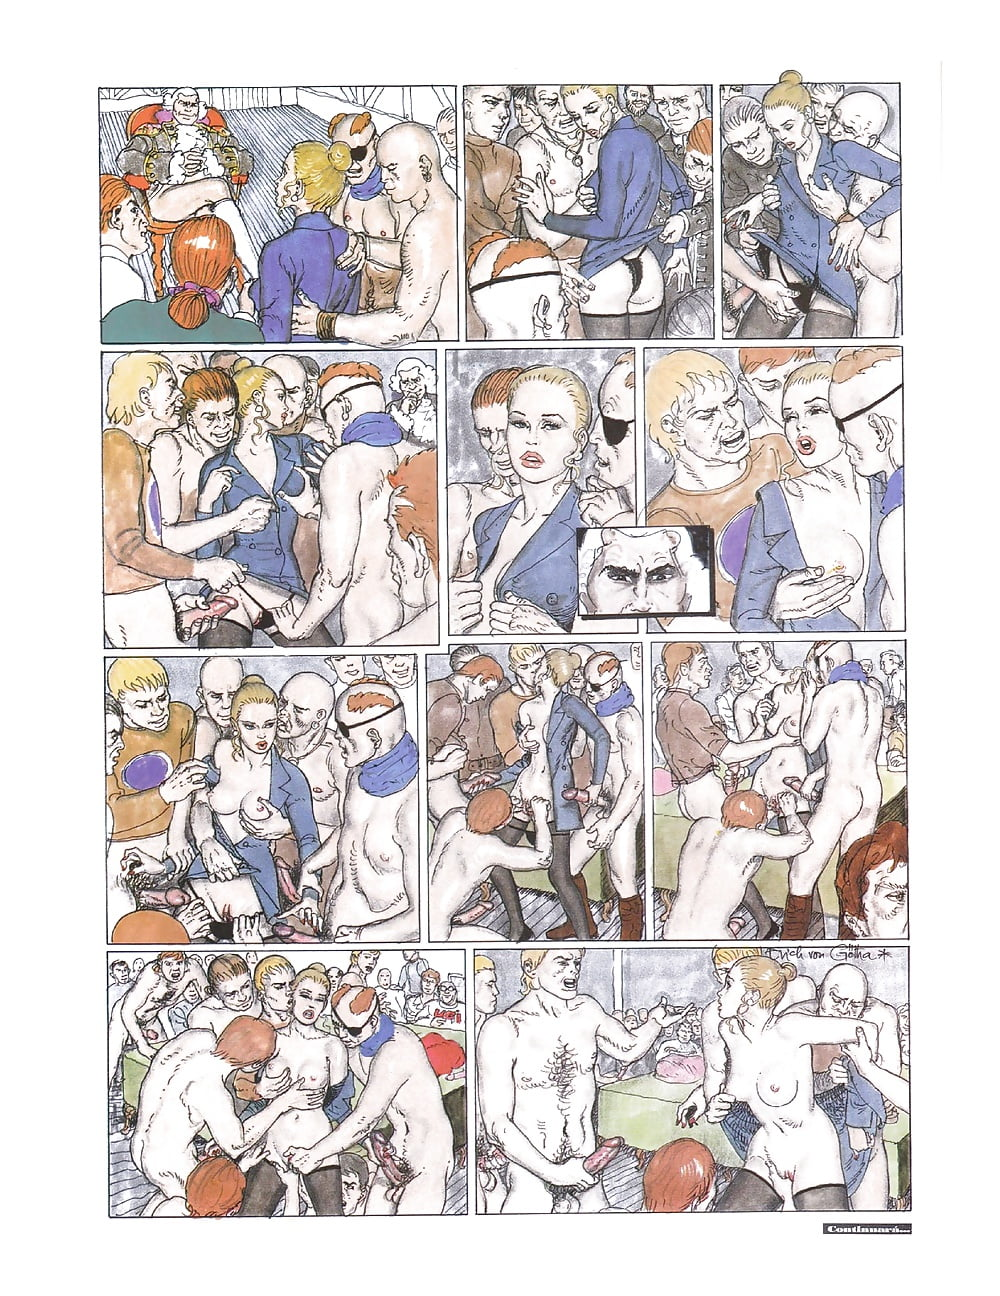 Maduras compradoras de arte peli en espanol - 2 part 5